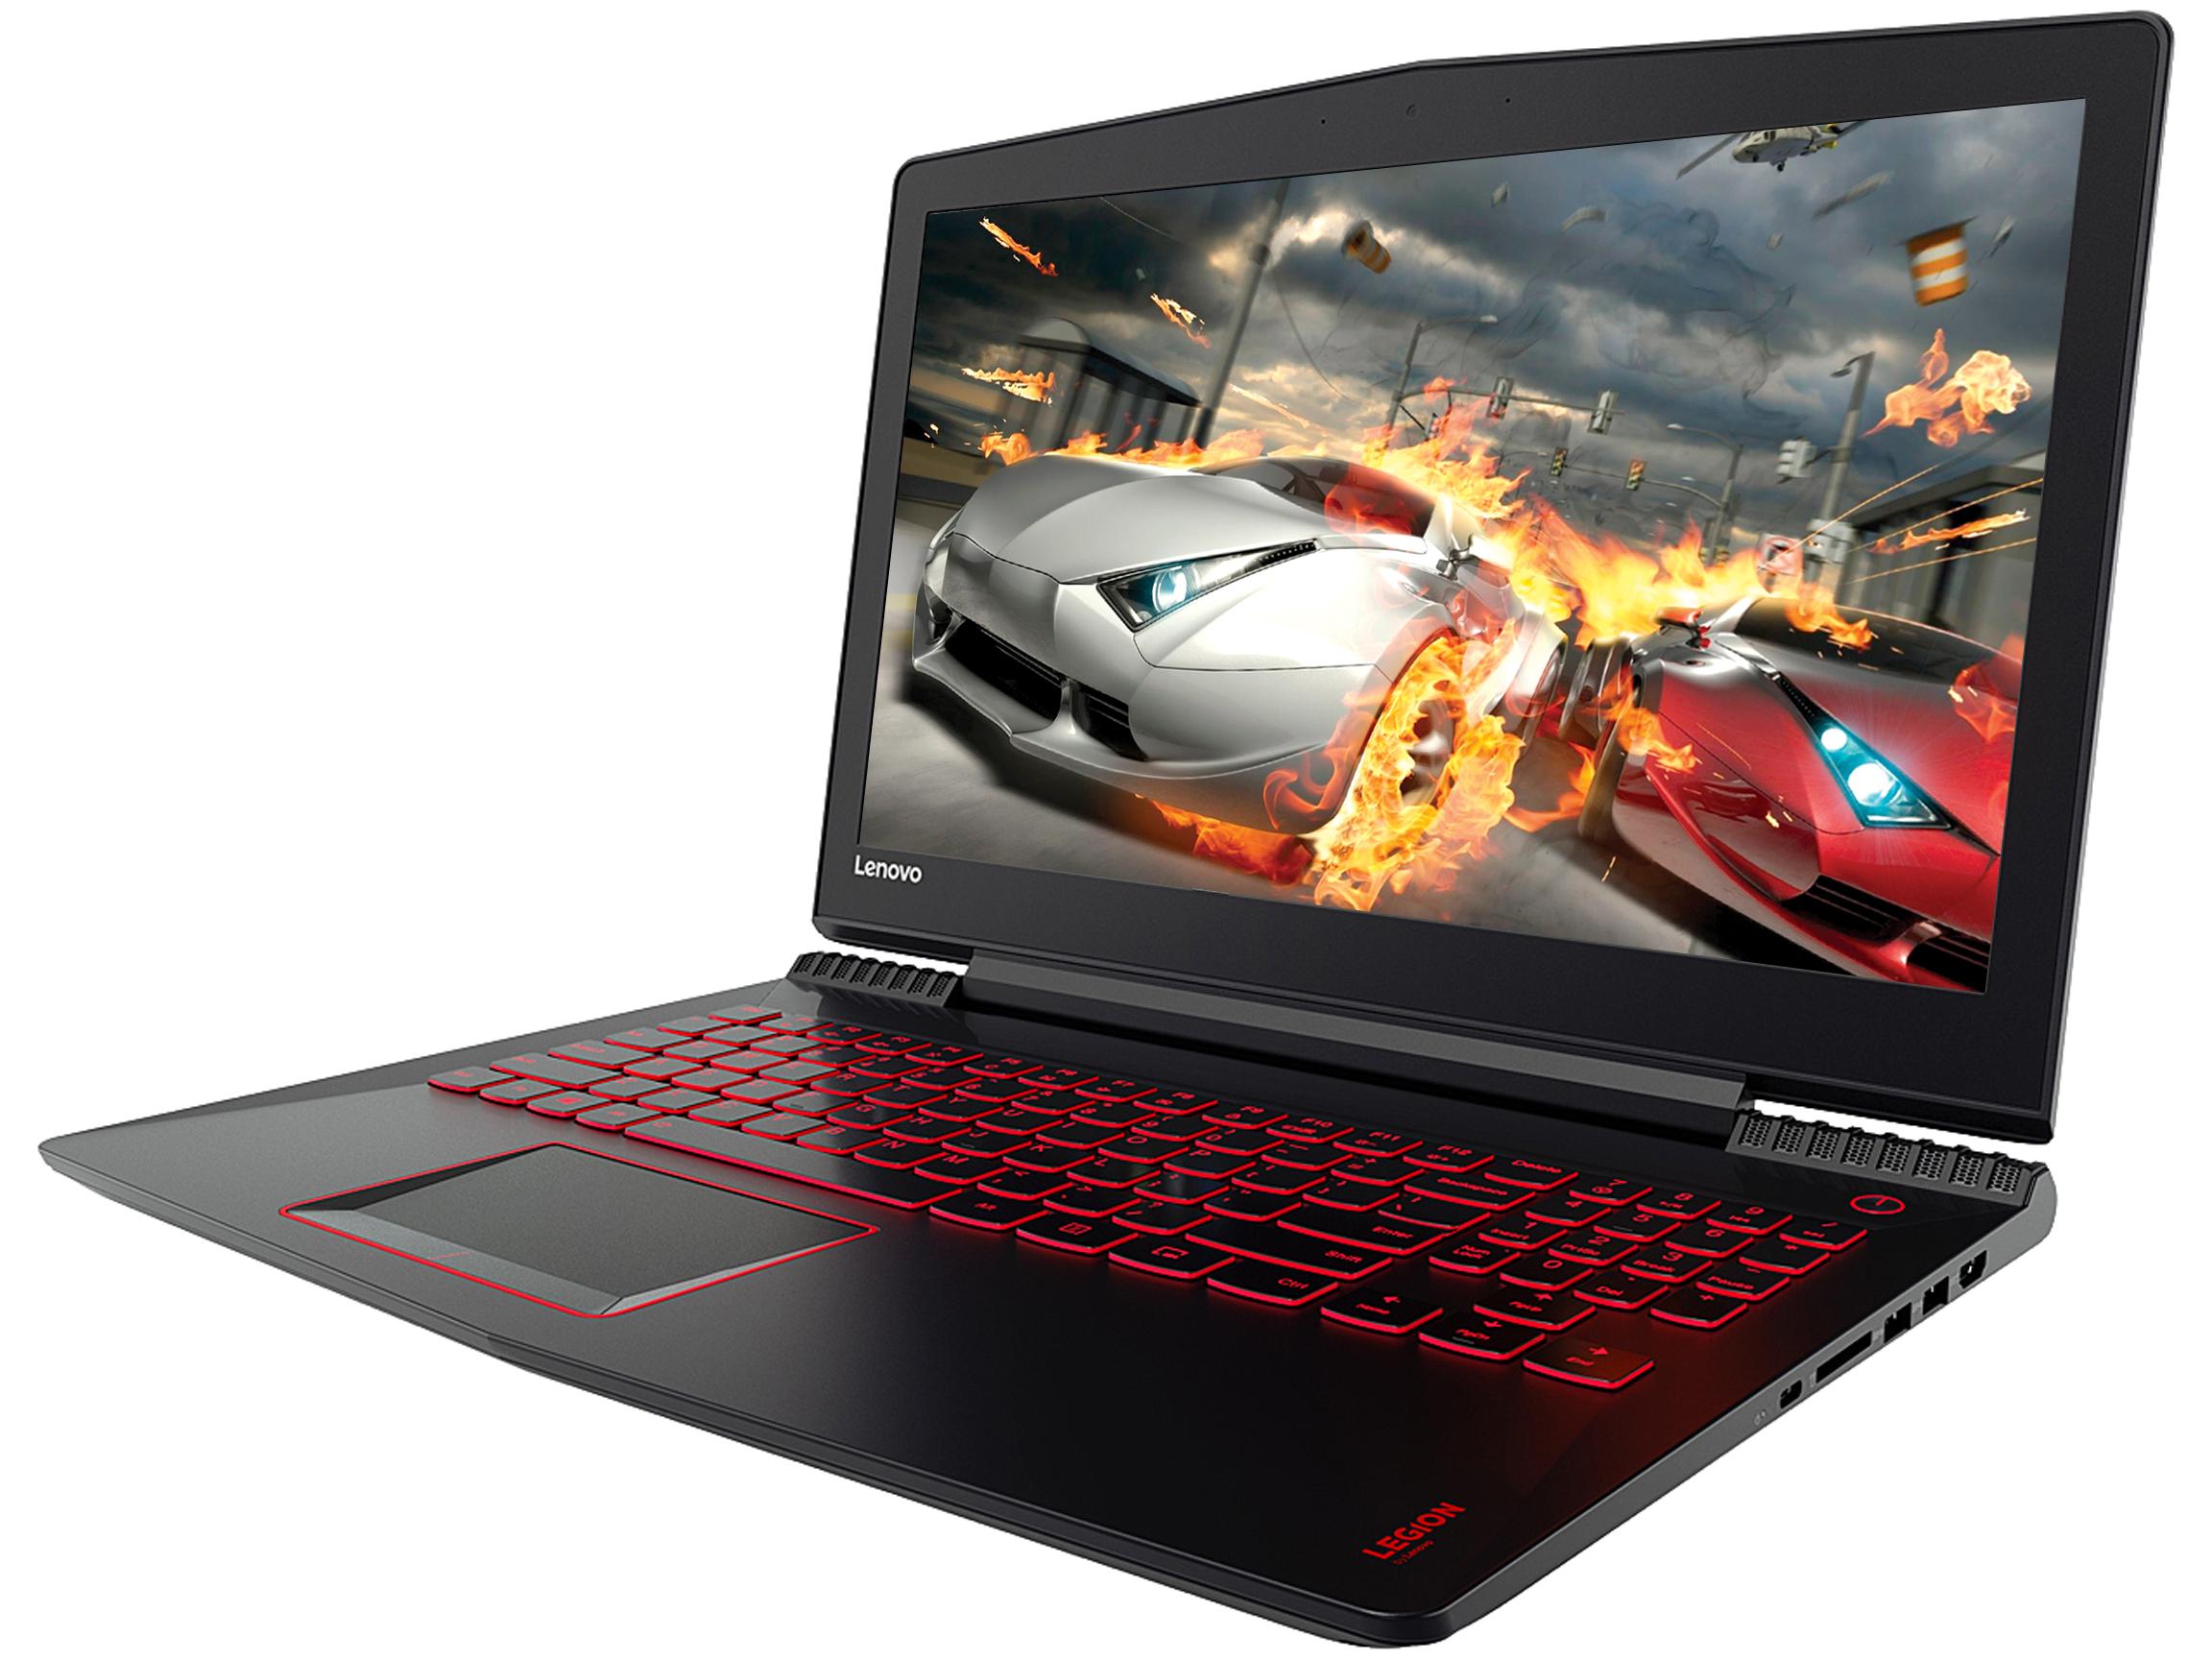 Lenovo Y520 (80WK00HSUS) Gaming Laptop Intel Core i7-7700HQ